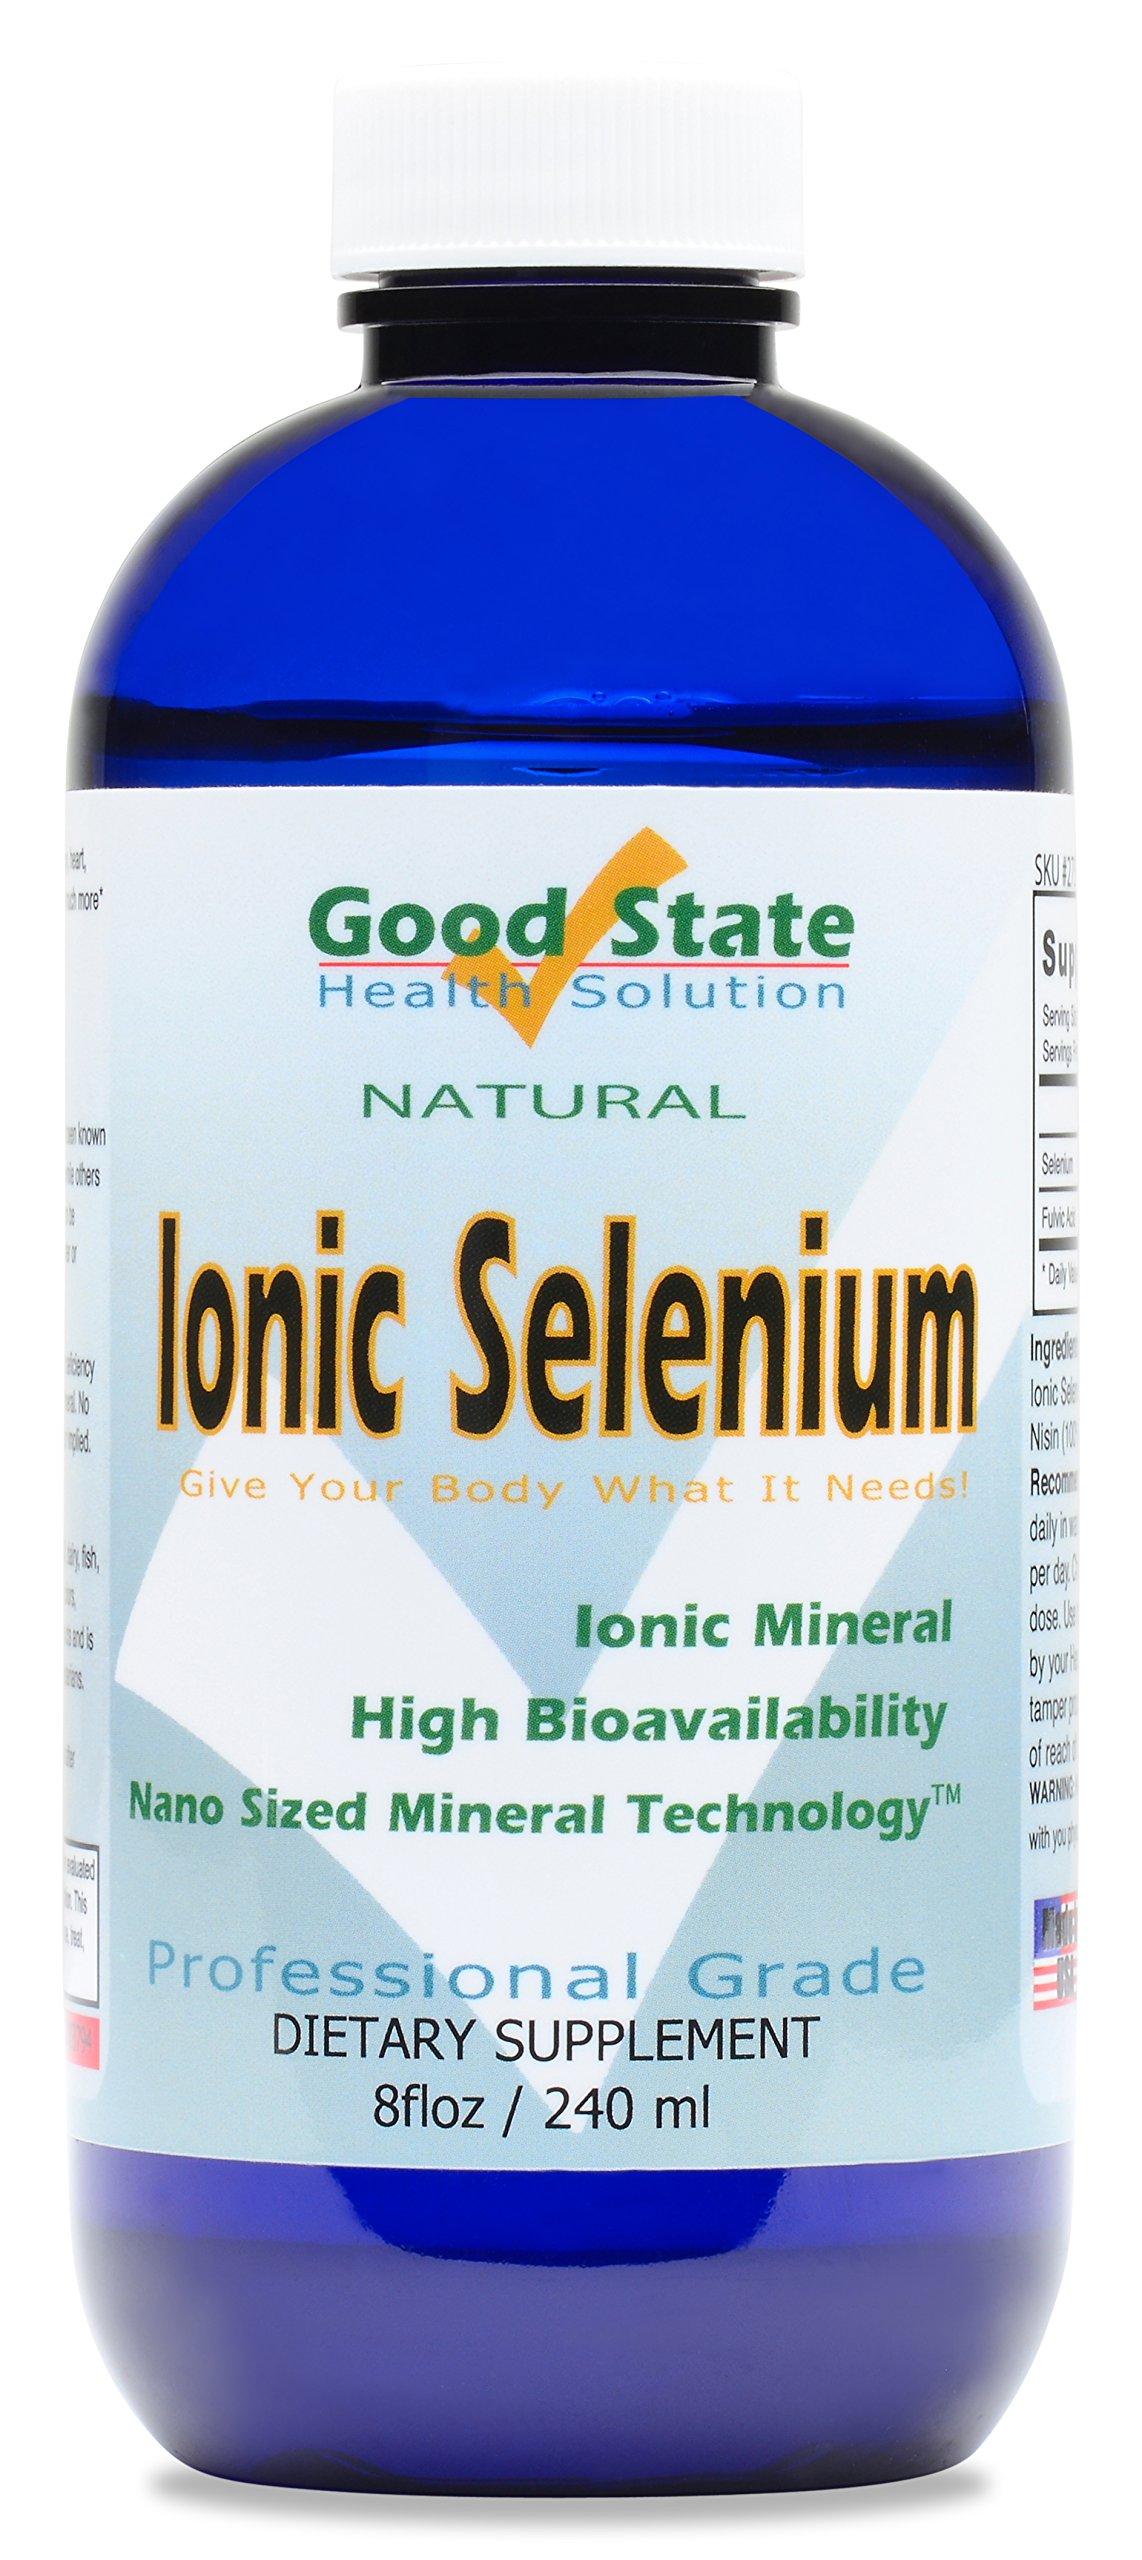 Good State Liquid Ionic Selenium (96 servings at 400 mcg elemental - 8 fl oz)